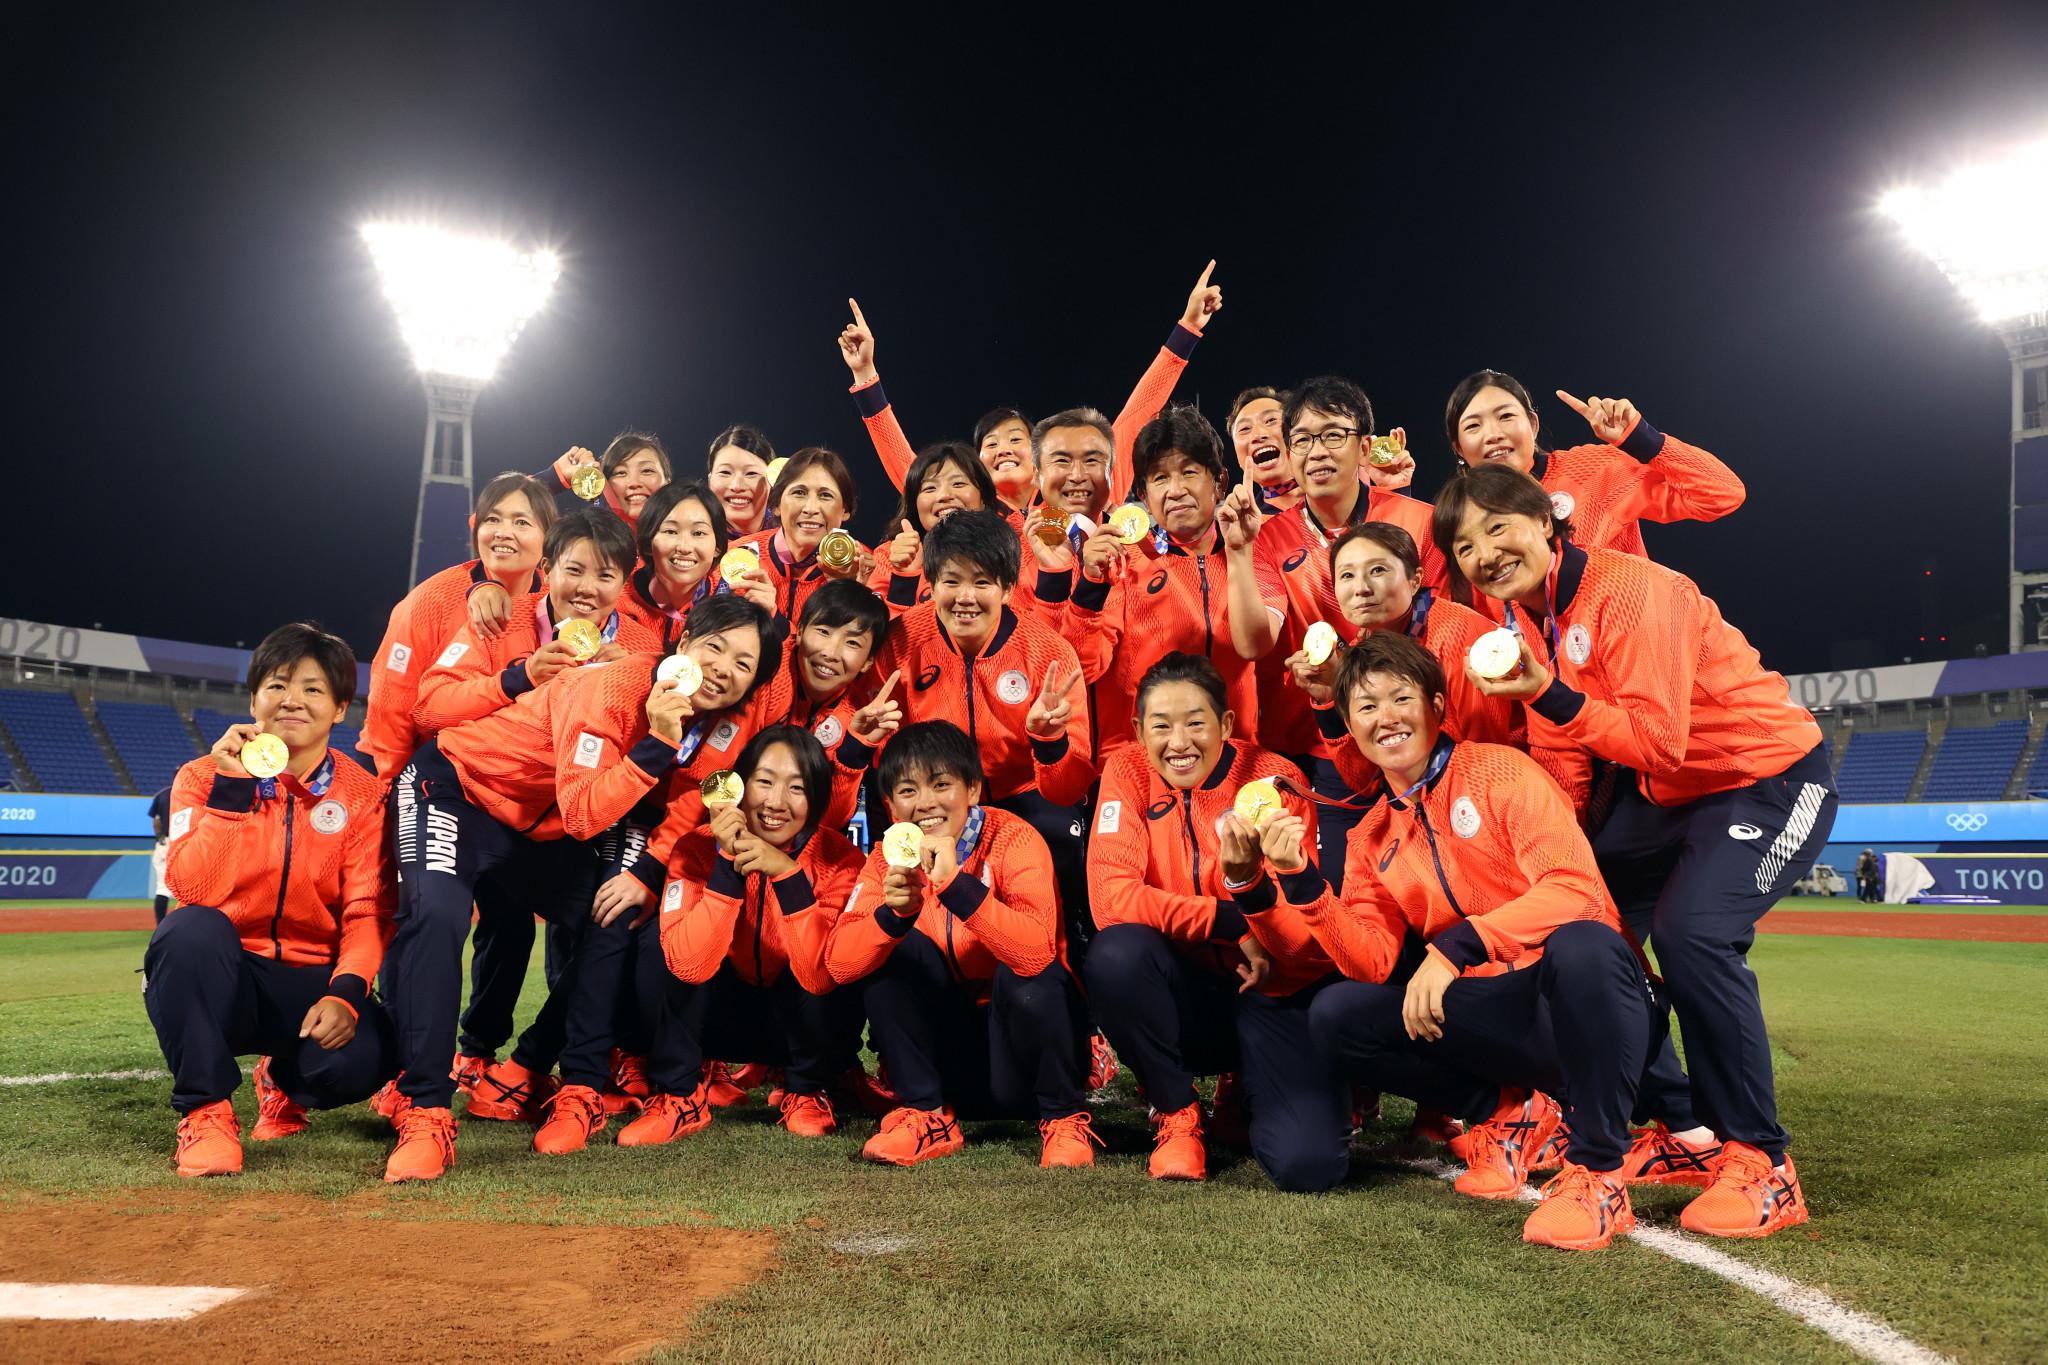 Hosts Japan win Tokyo 2020 softball gold to haunt US again